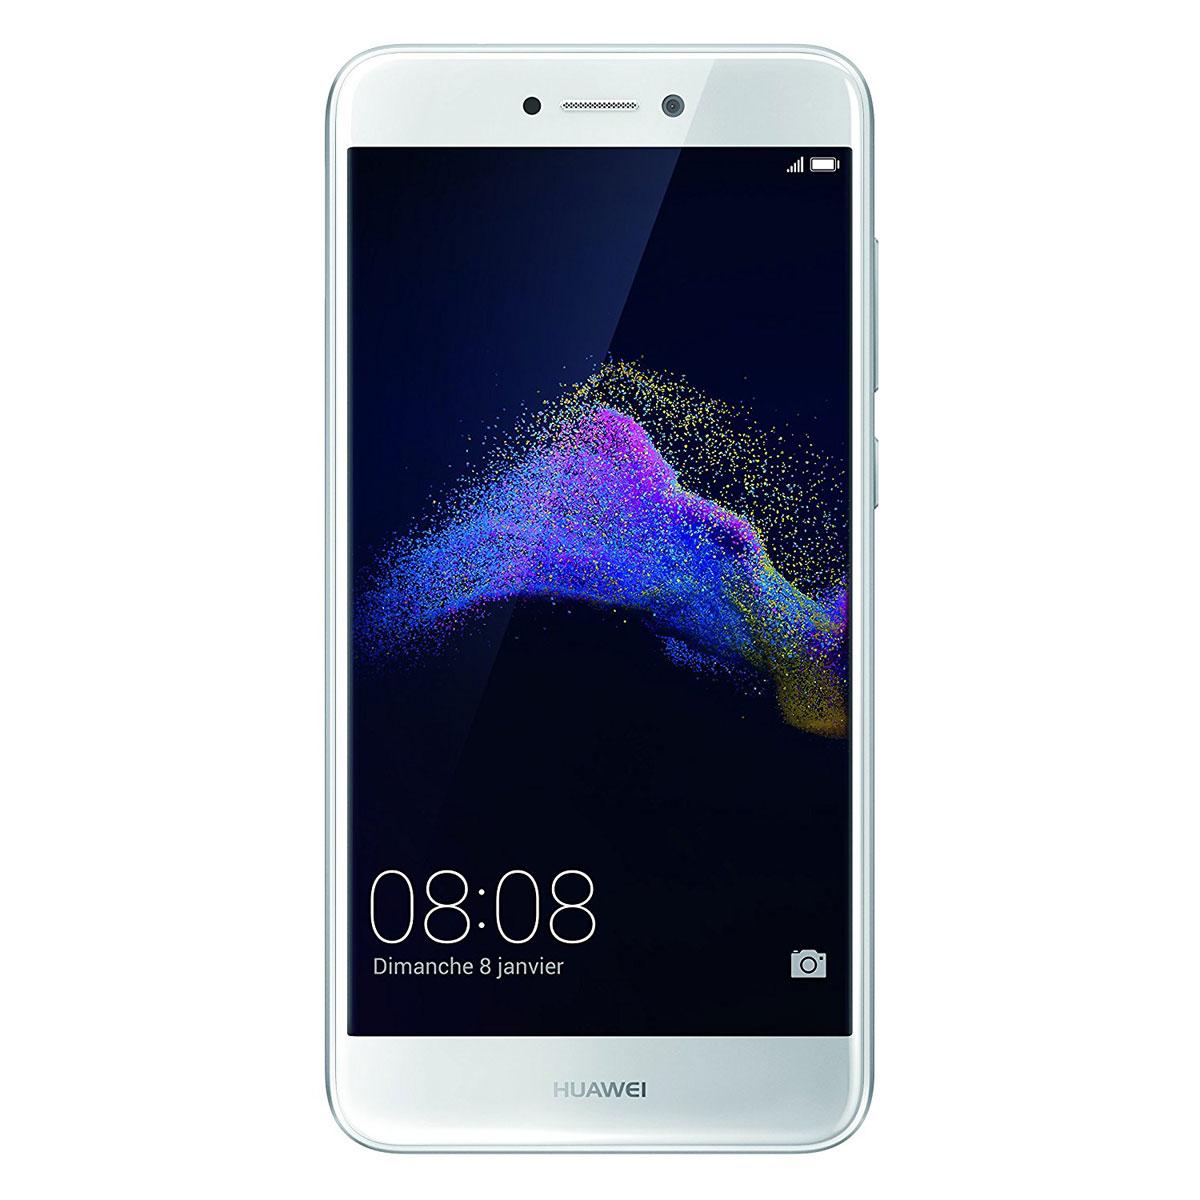 "Mobile & smartphone Huawei P8 Lite 2017 Blanc Smartphone 4G-LTE Advanced Dual SIM - Kirin 655 8-Core 2.1 GHz - RAM 3 Go - Ecran tactile 5.2"" 1080 x 1920 - 16 Go - NFC/Bluetooth 4.1 - 3000 mAh - Android 7.0"